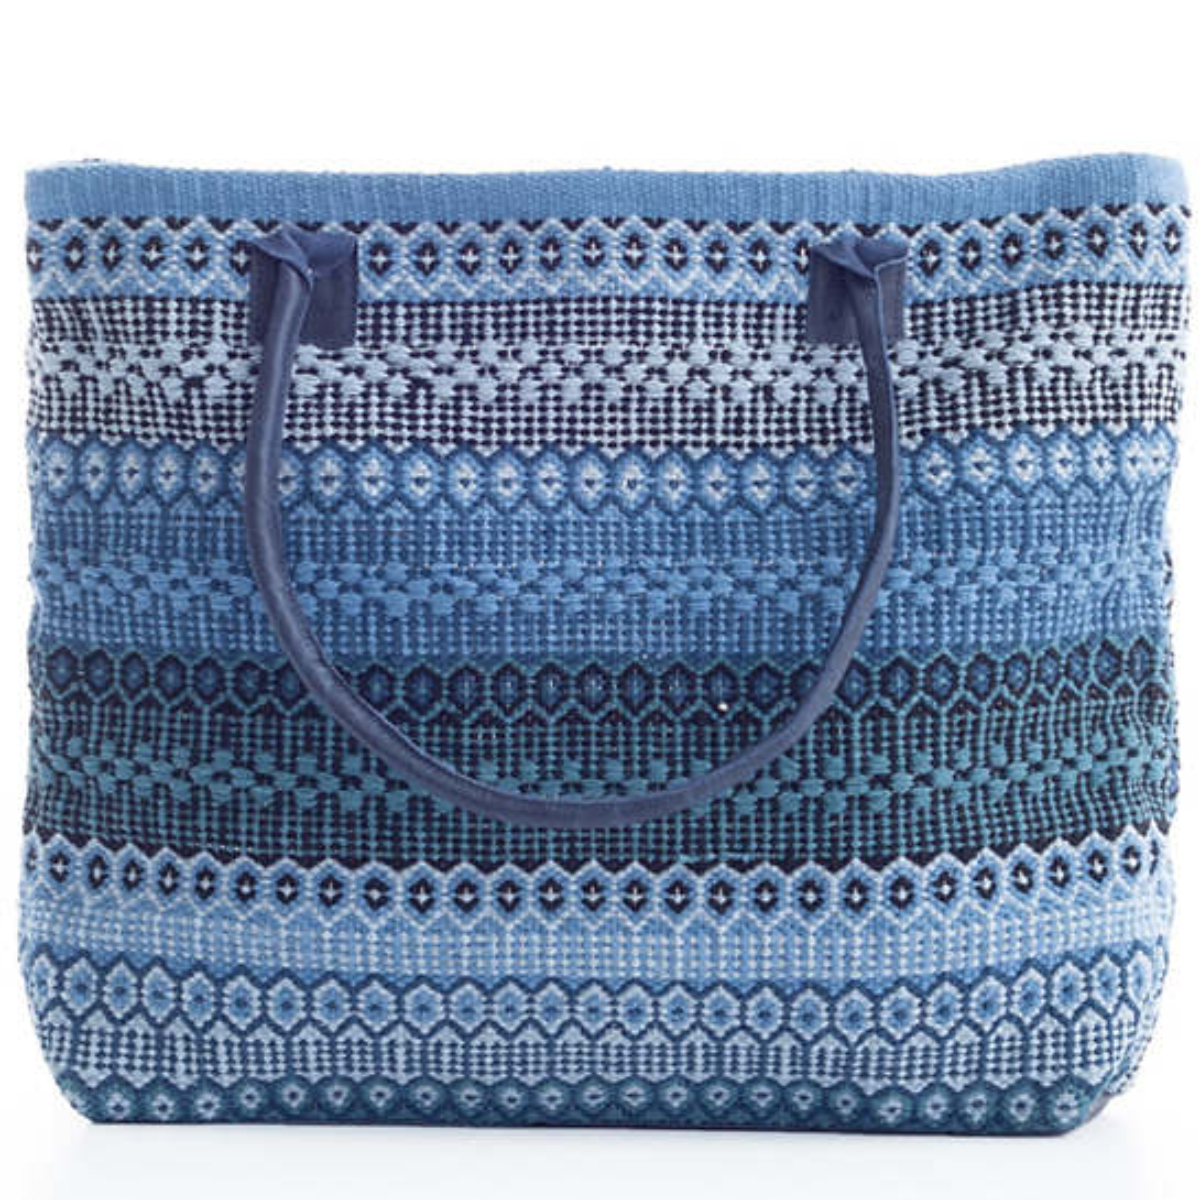 Gypsy Stripe Denim/Navy Woven Cotton Tote Bag